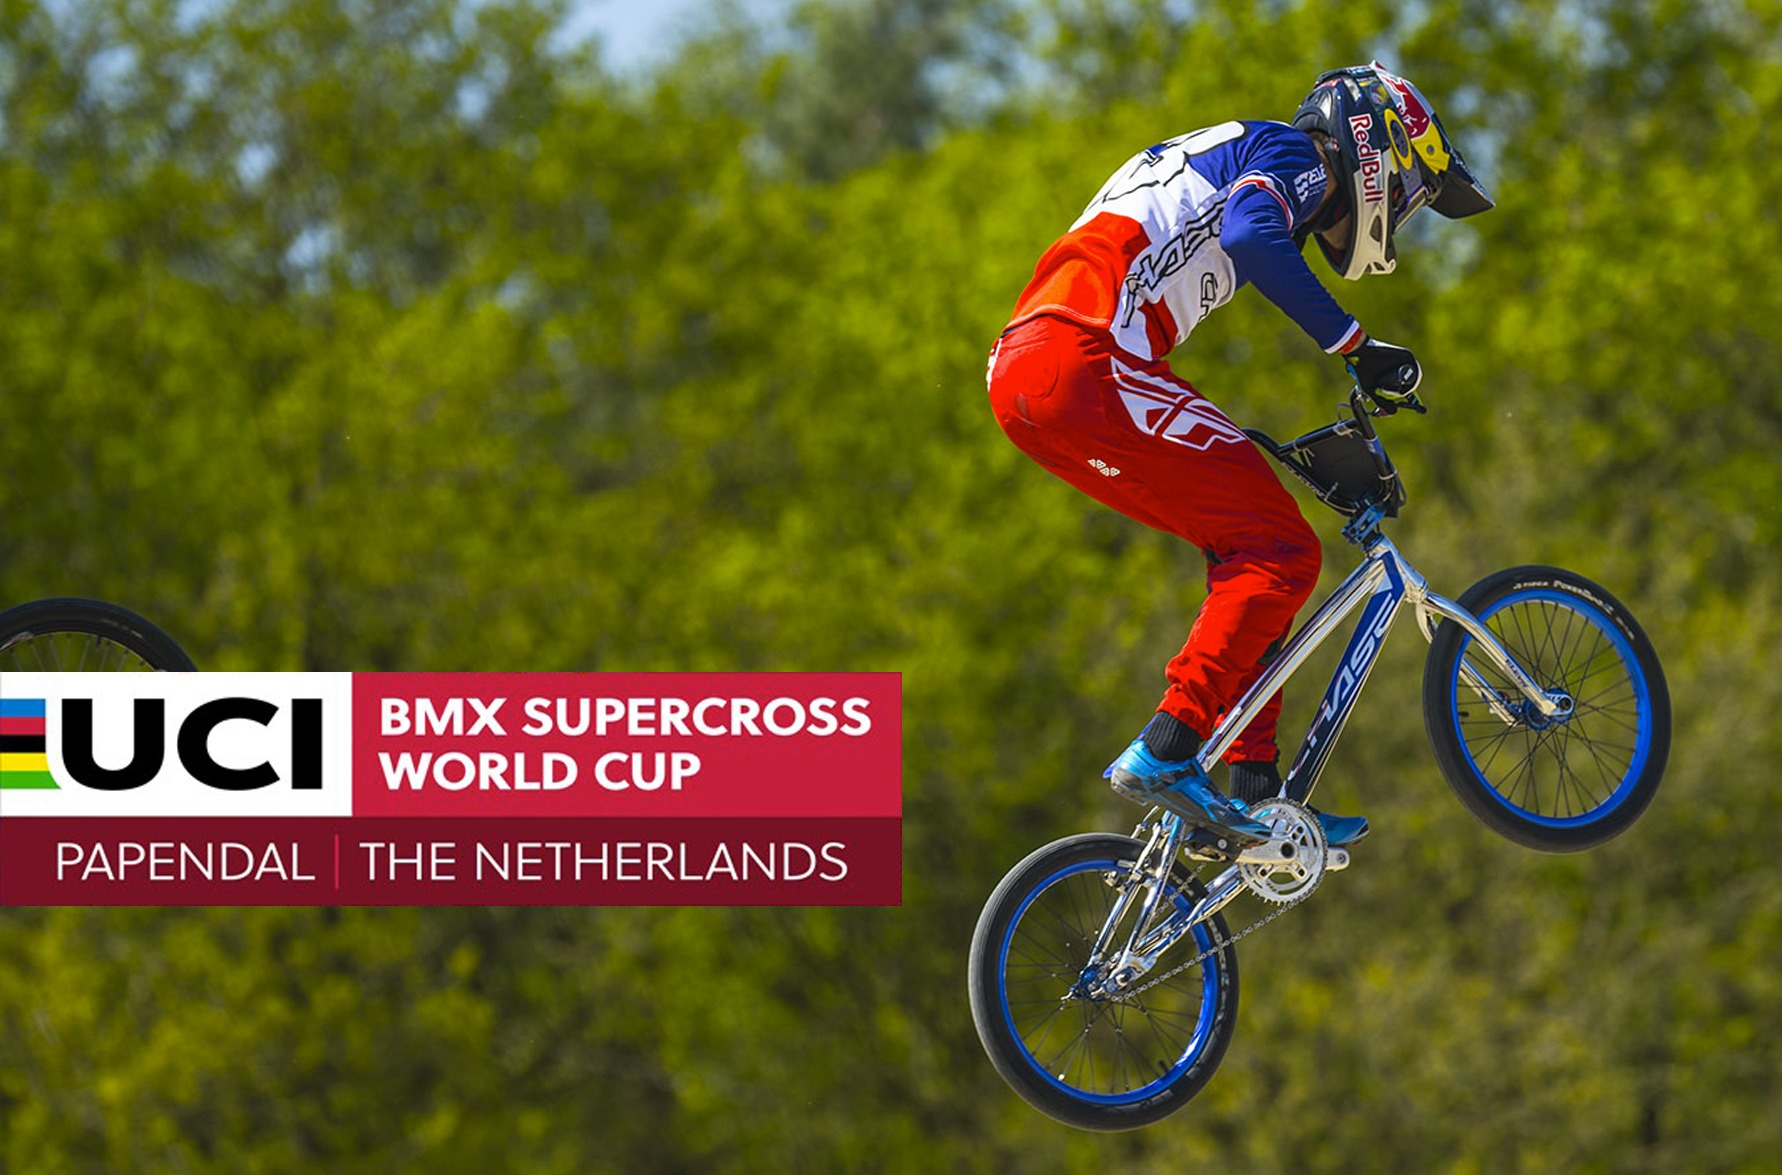 UCI BMX SX - Papendal, Netherlands